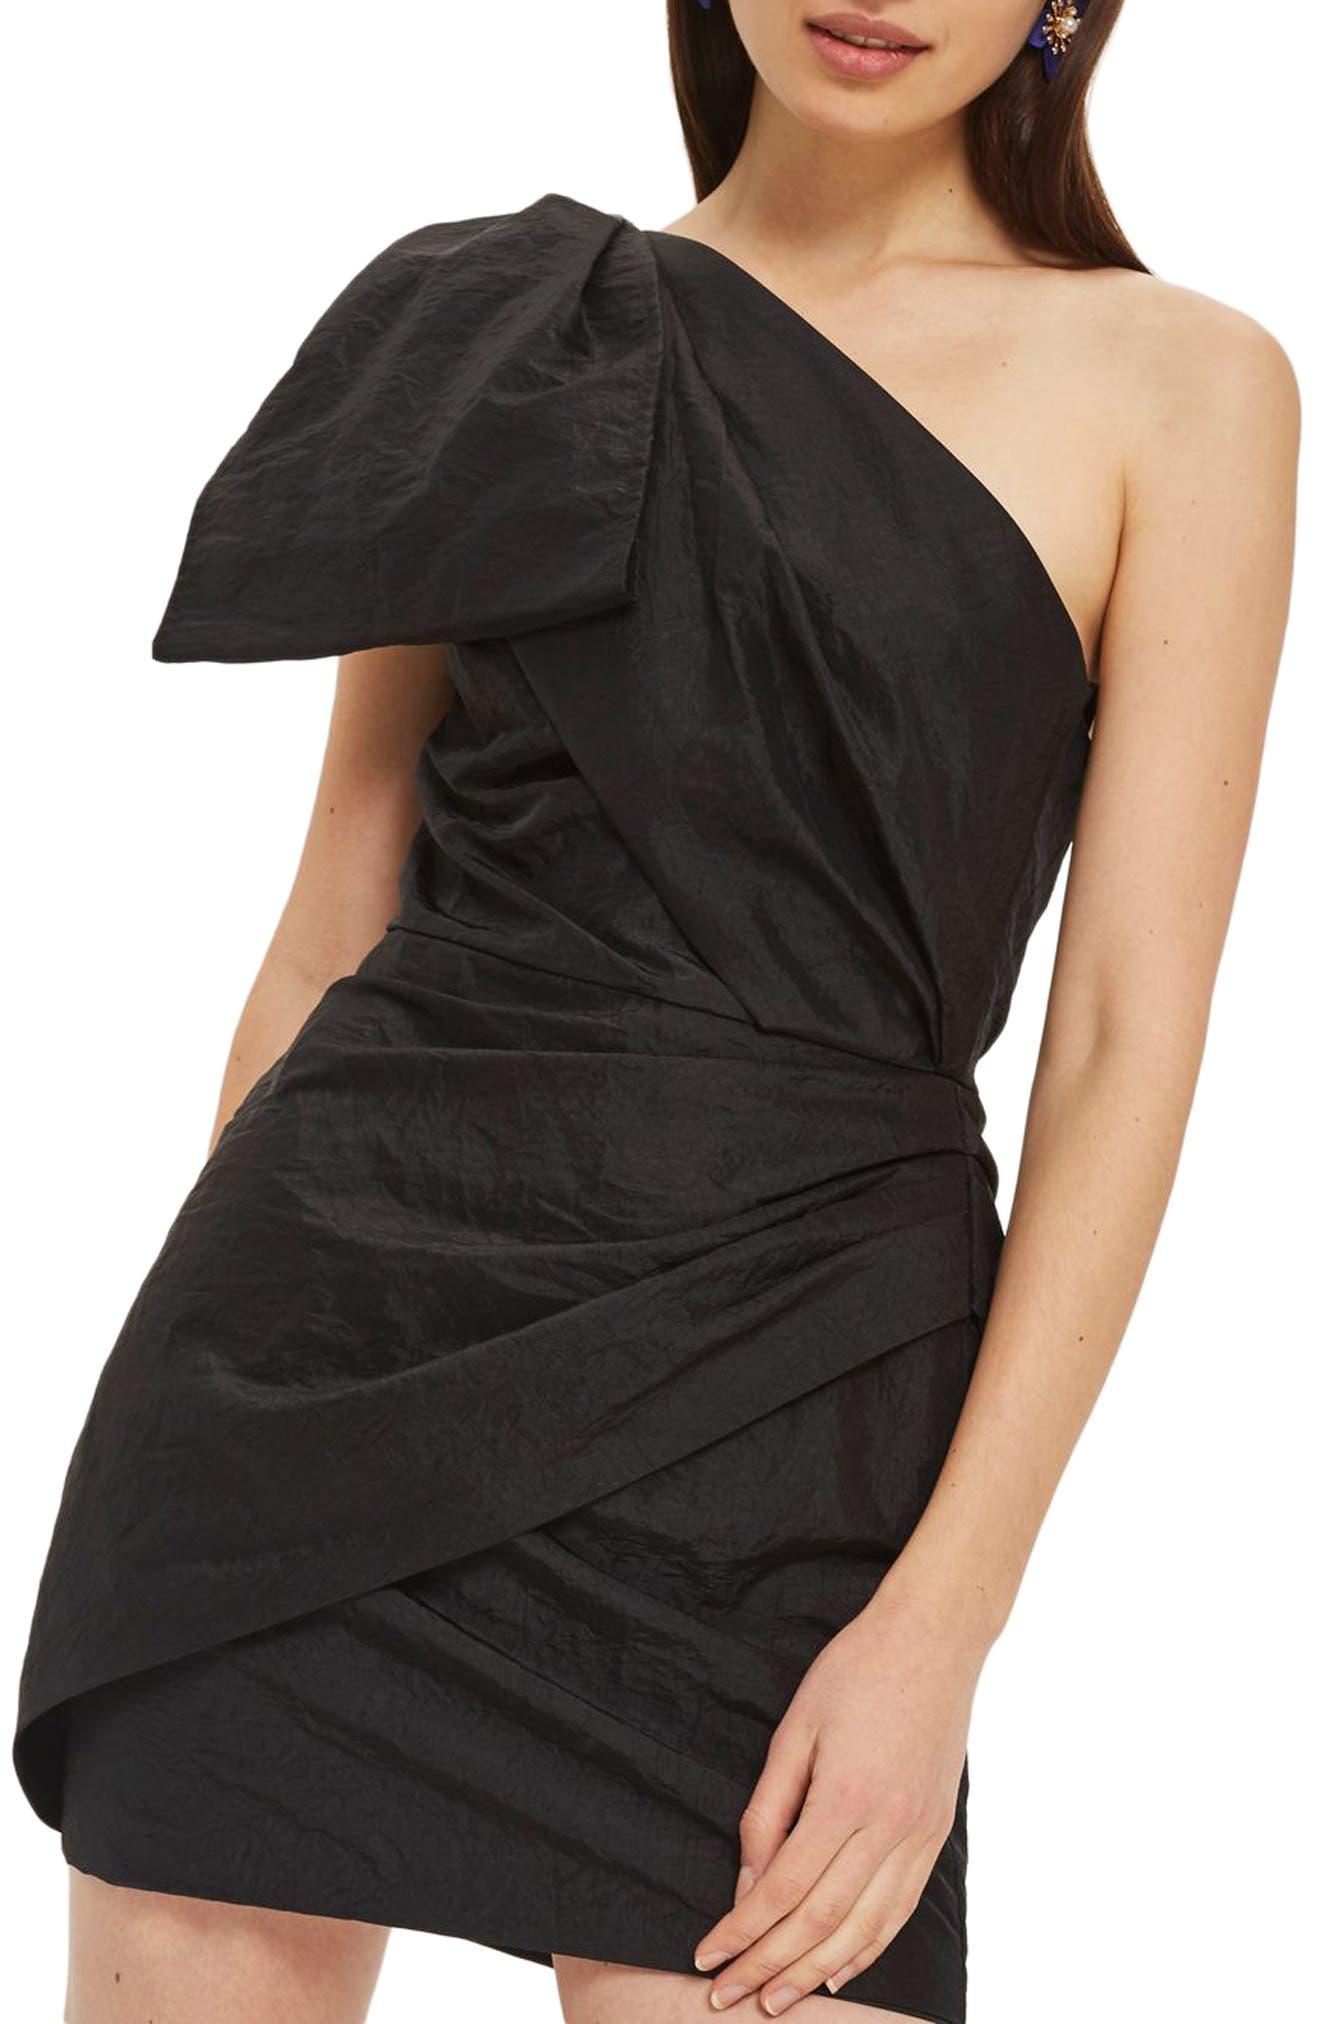 Topshop Taffeta Bow One-Shoulder Dress